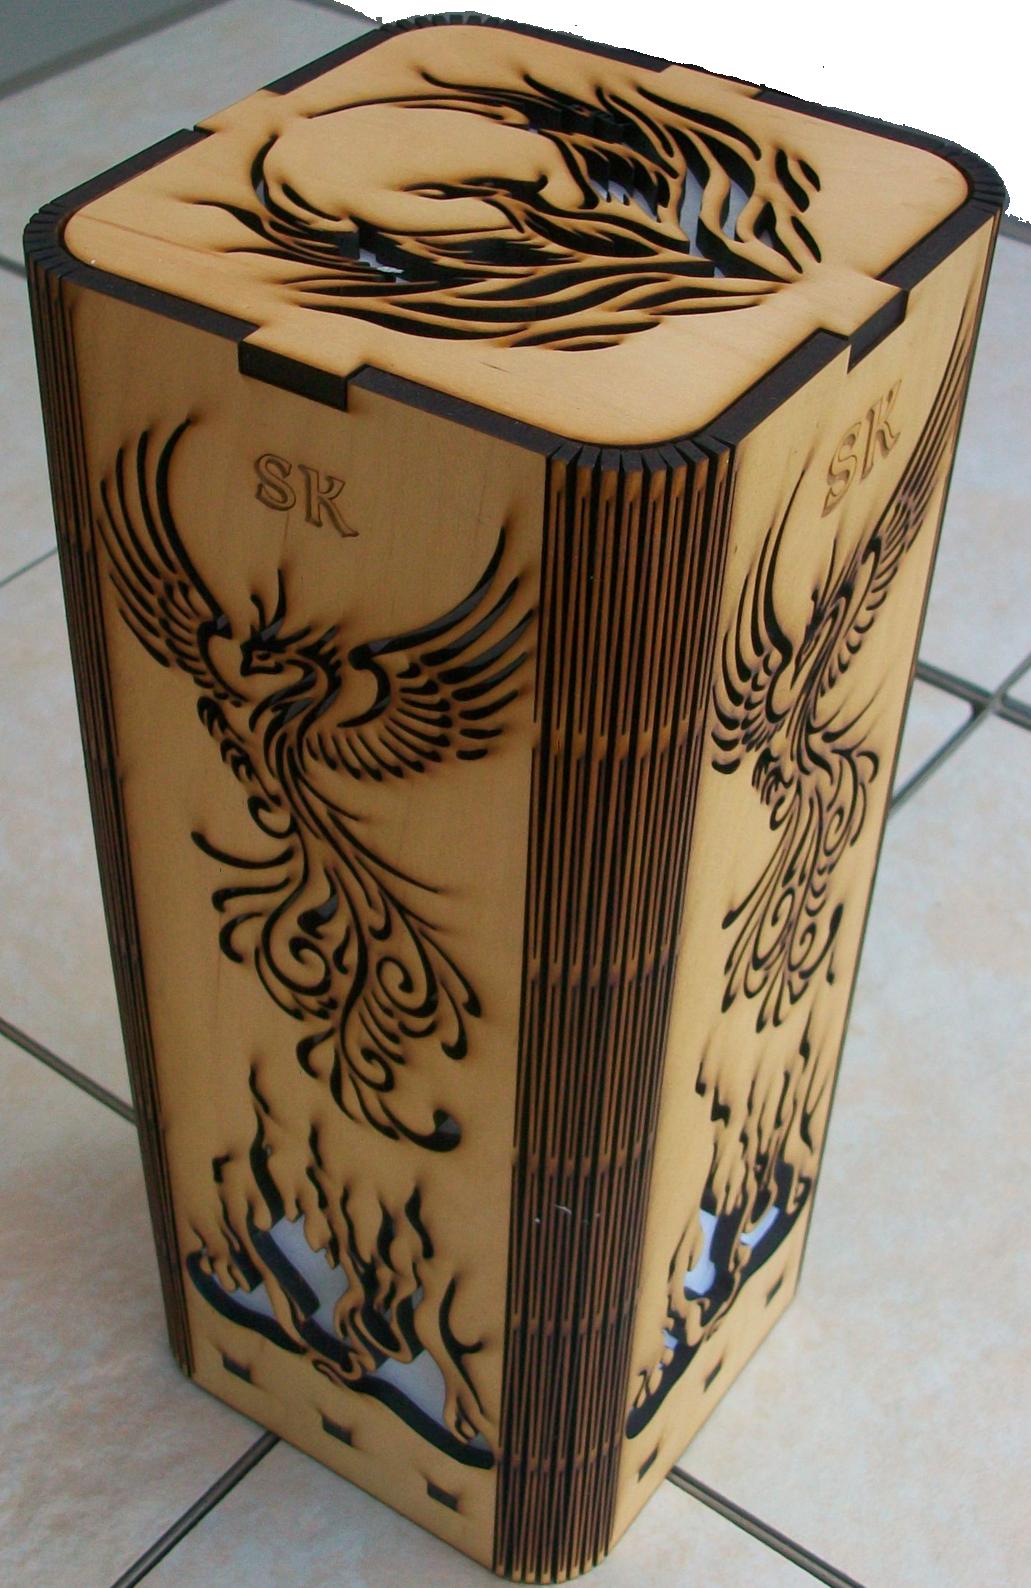 Personalized Phoenix Rising Laser Cut Laser Engraved Lamp